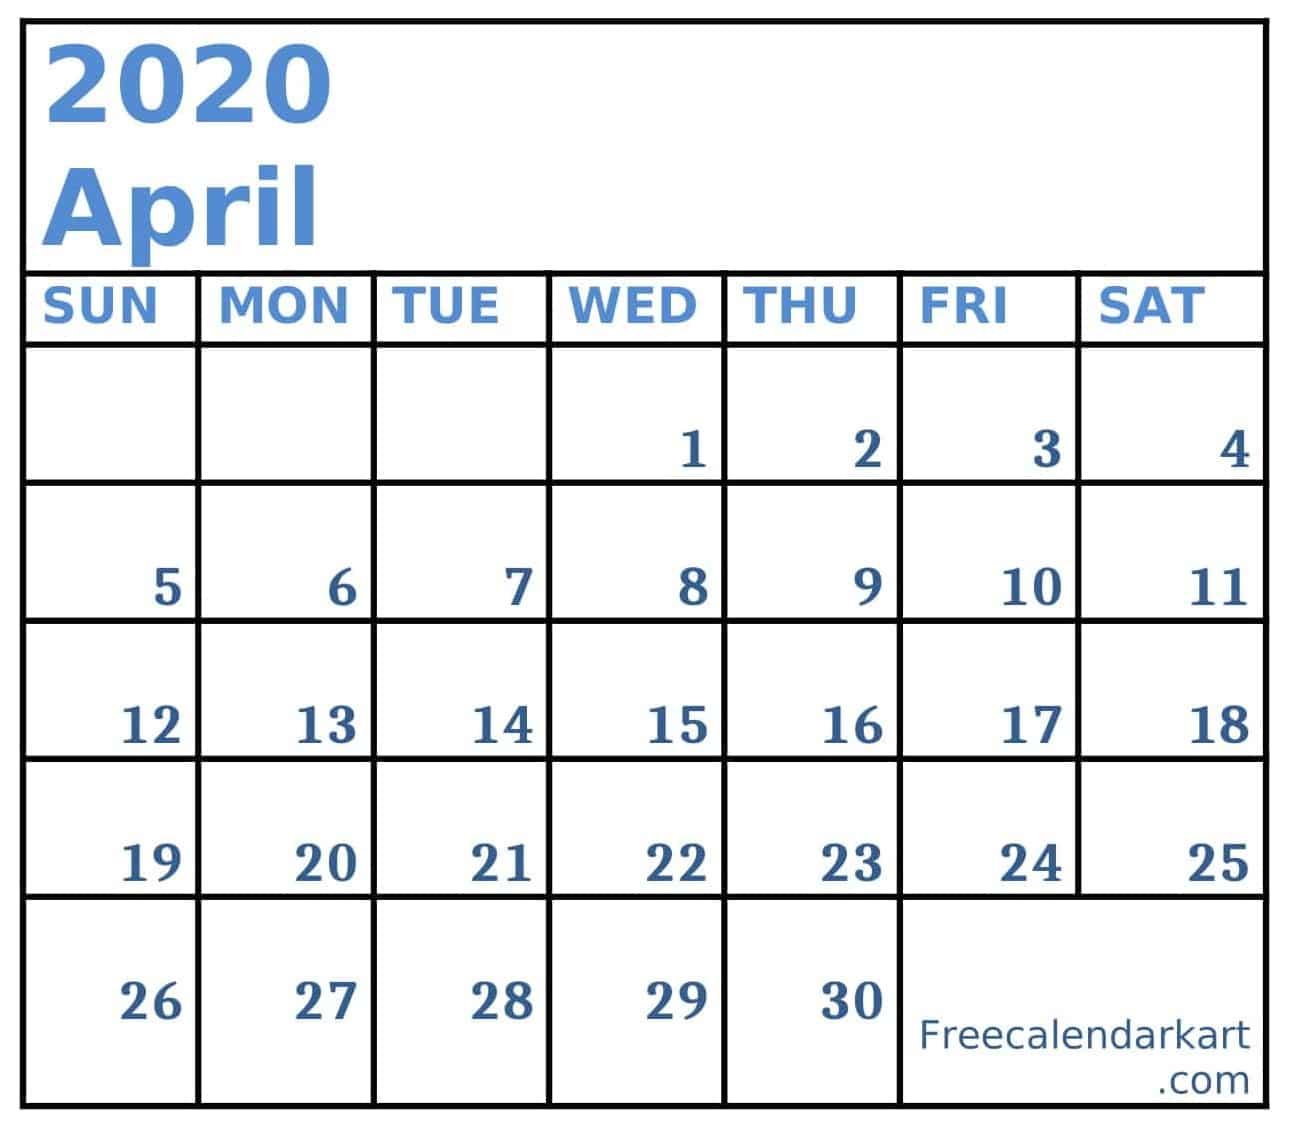 Blank April 2020 Calendar Template Free